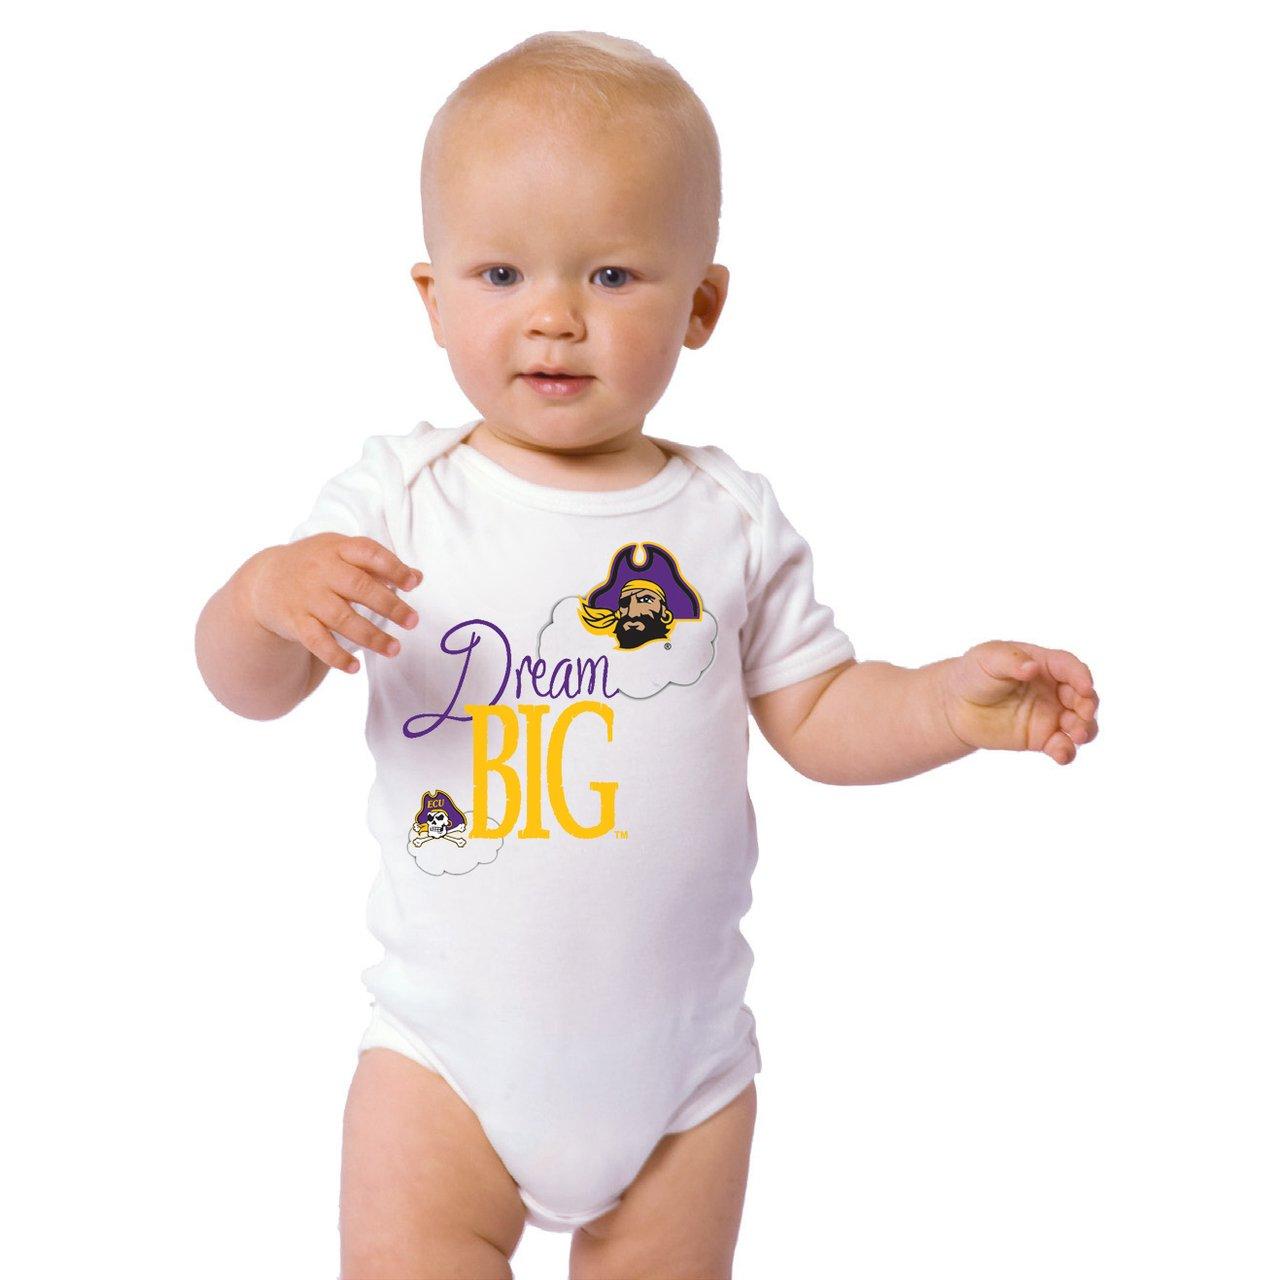 史上最も激安 East Carolina Pirates Dream Pirates Big Baby B073RYGGC1 Onesie Newborn B073RYGGC1 Newborn, 長野市:7bc6e211 --- svecha37.ru